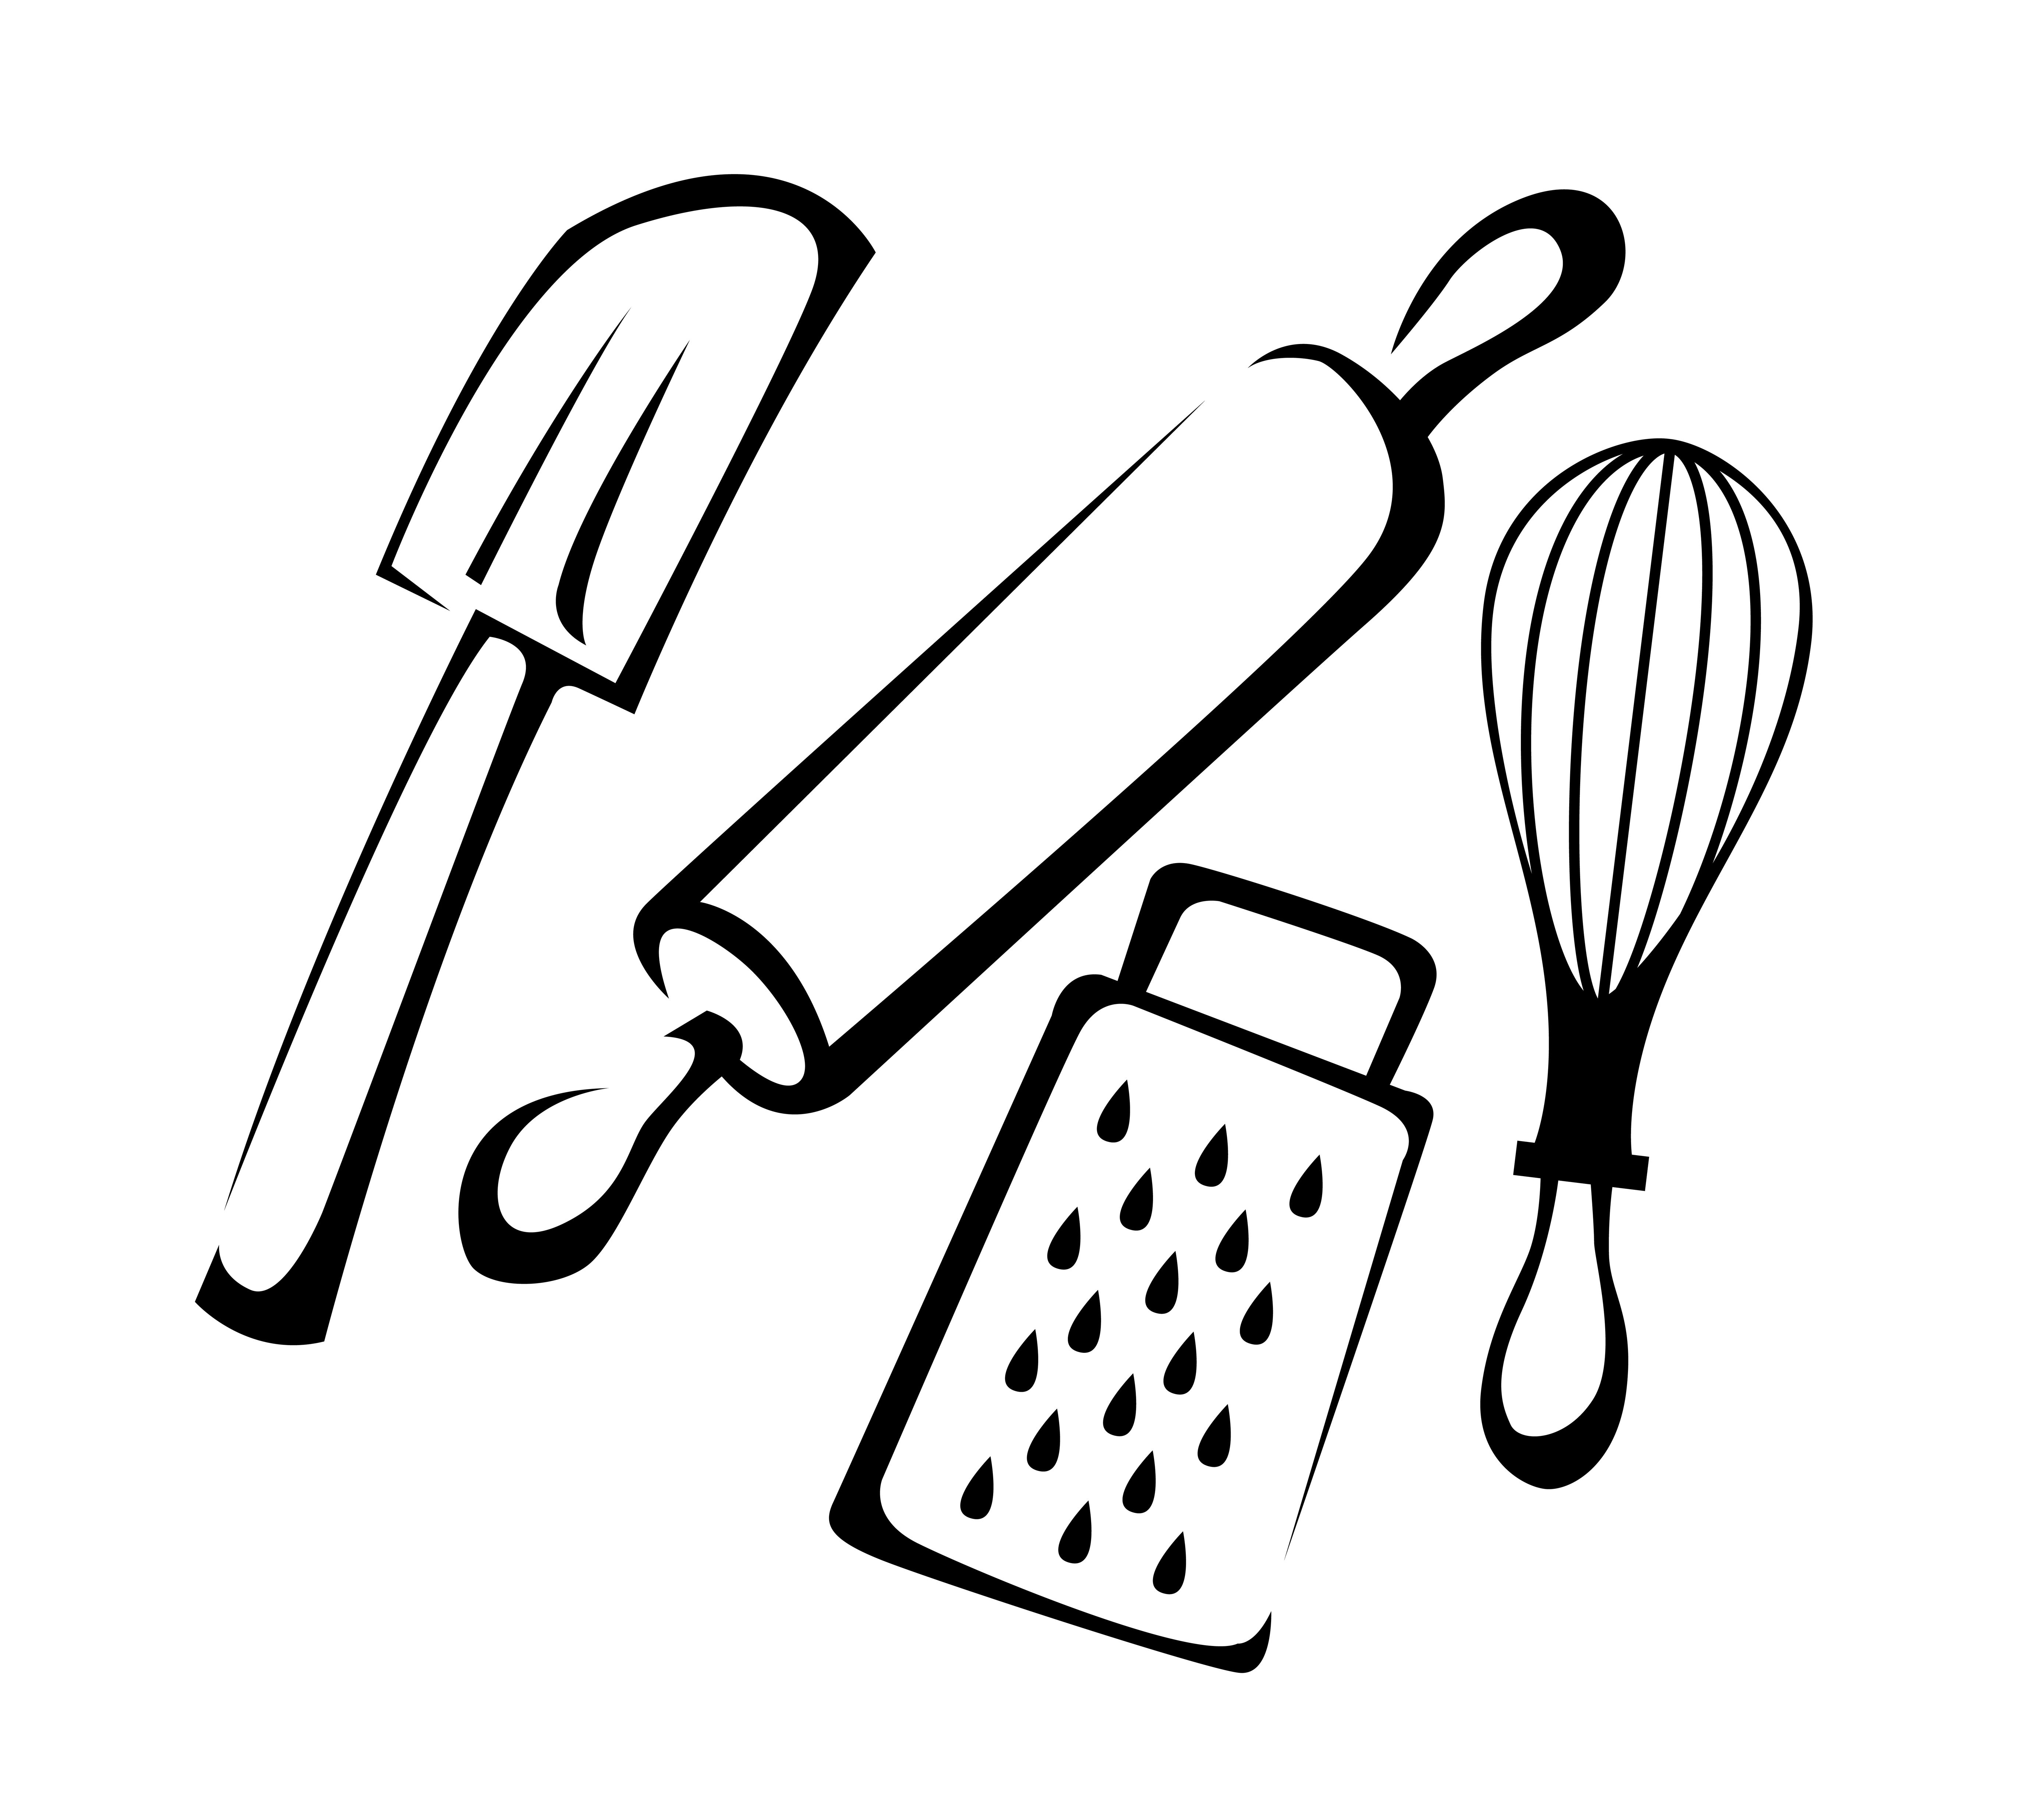 Kitchen utensils drawing for kids - Cartoon Rubber Spatula Cartoon Cooking 150x150